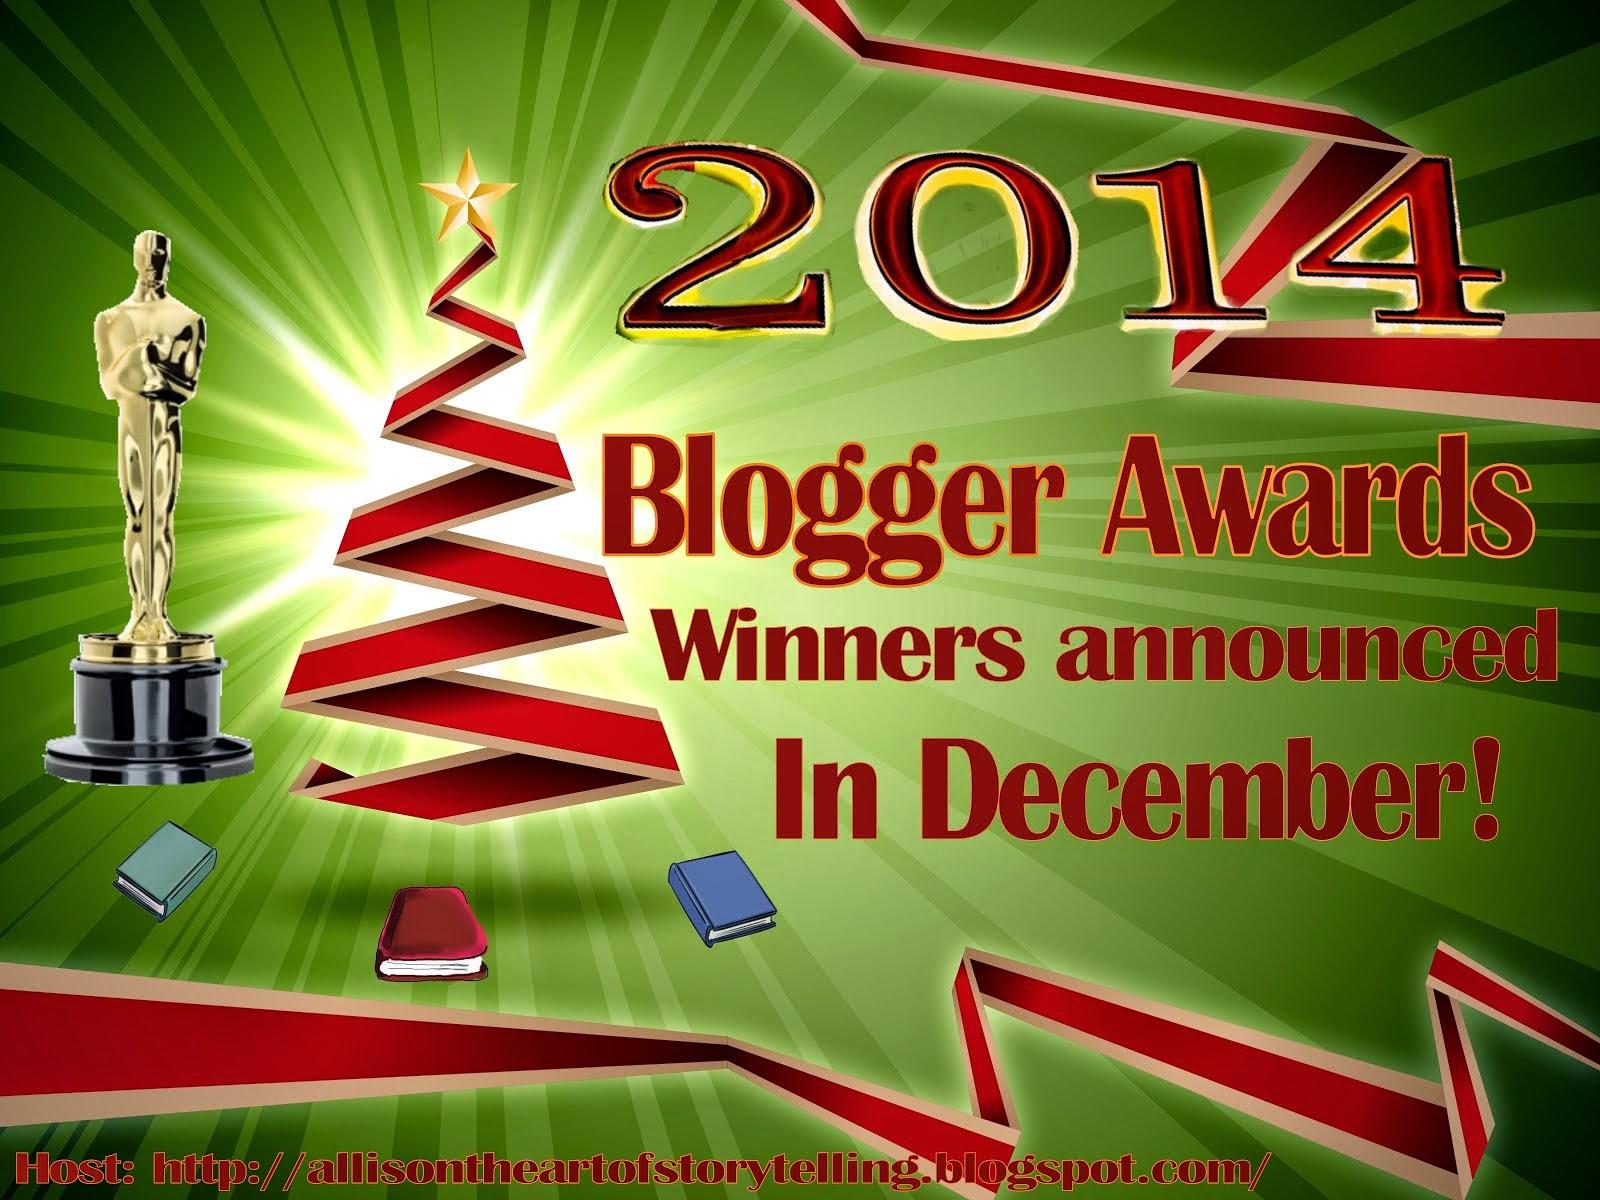 The 2014 Blogger Awards